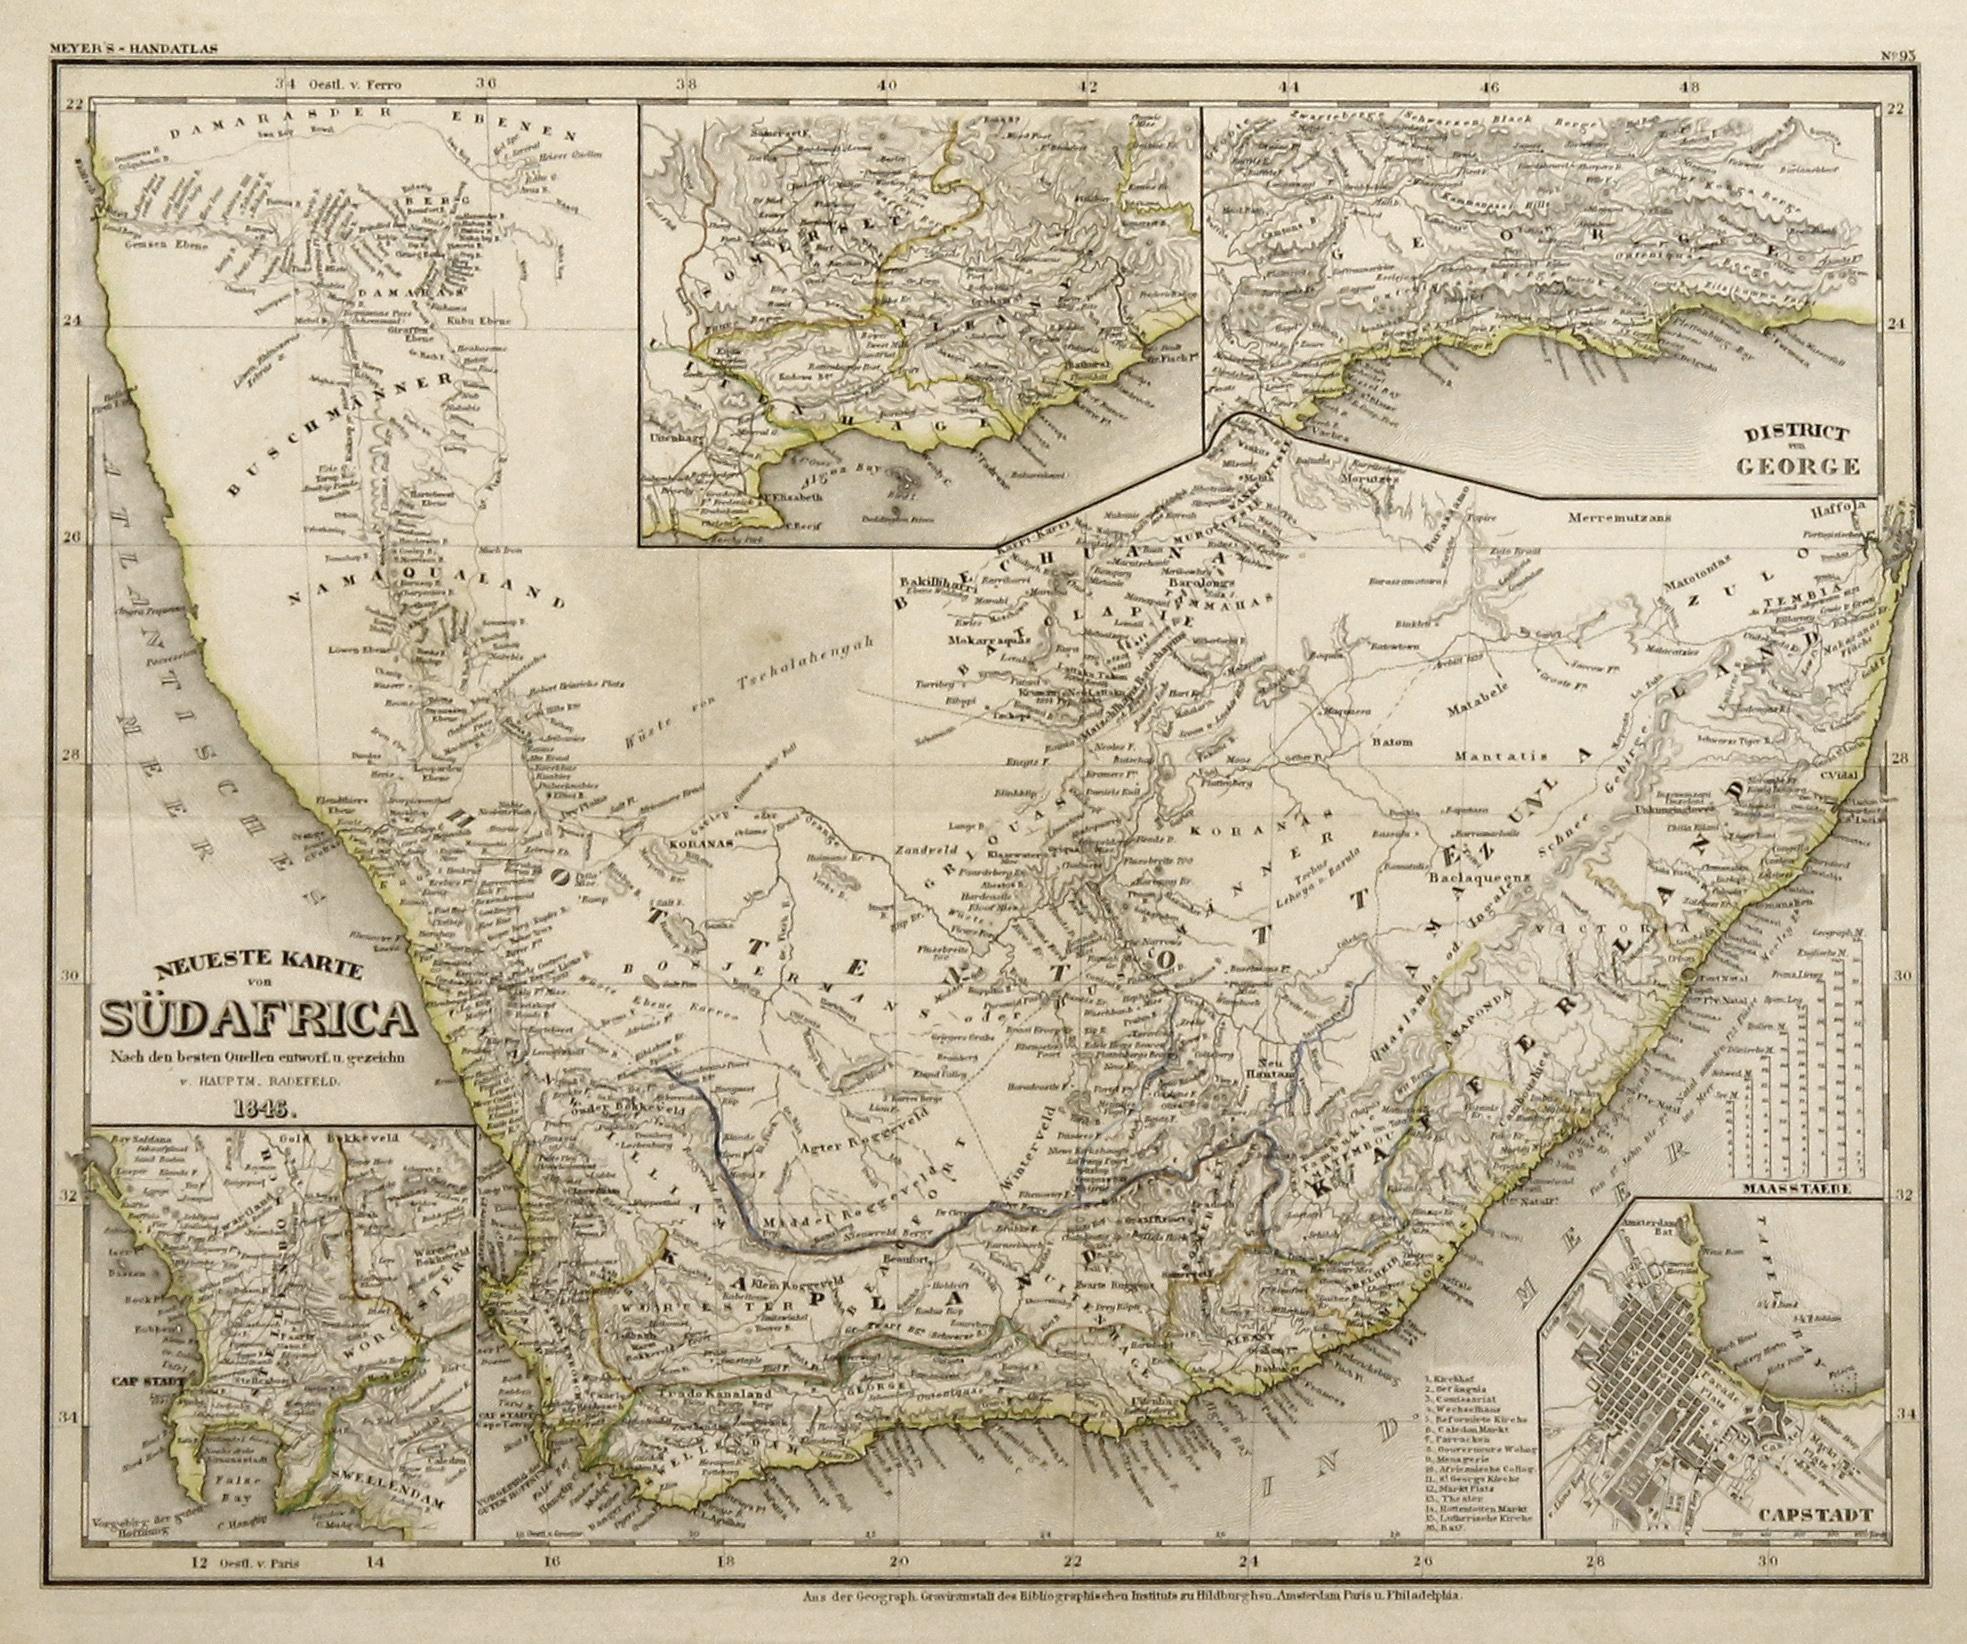 Südafrika Karte.Stahlstich Karte V Radefeld Aus Meyers